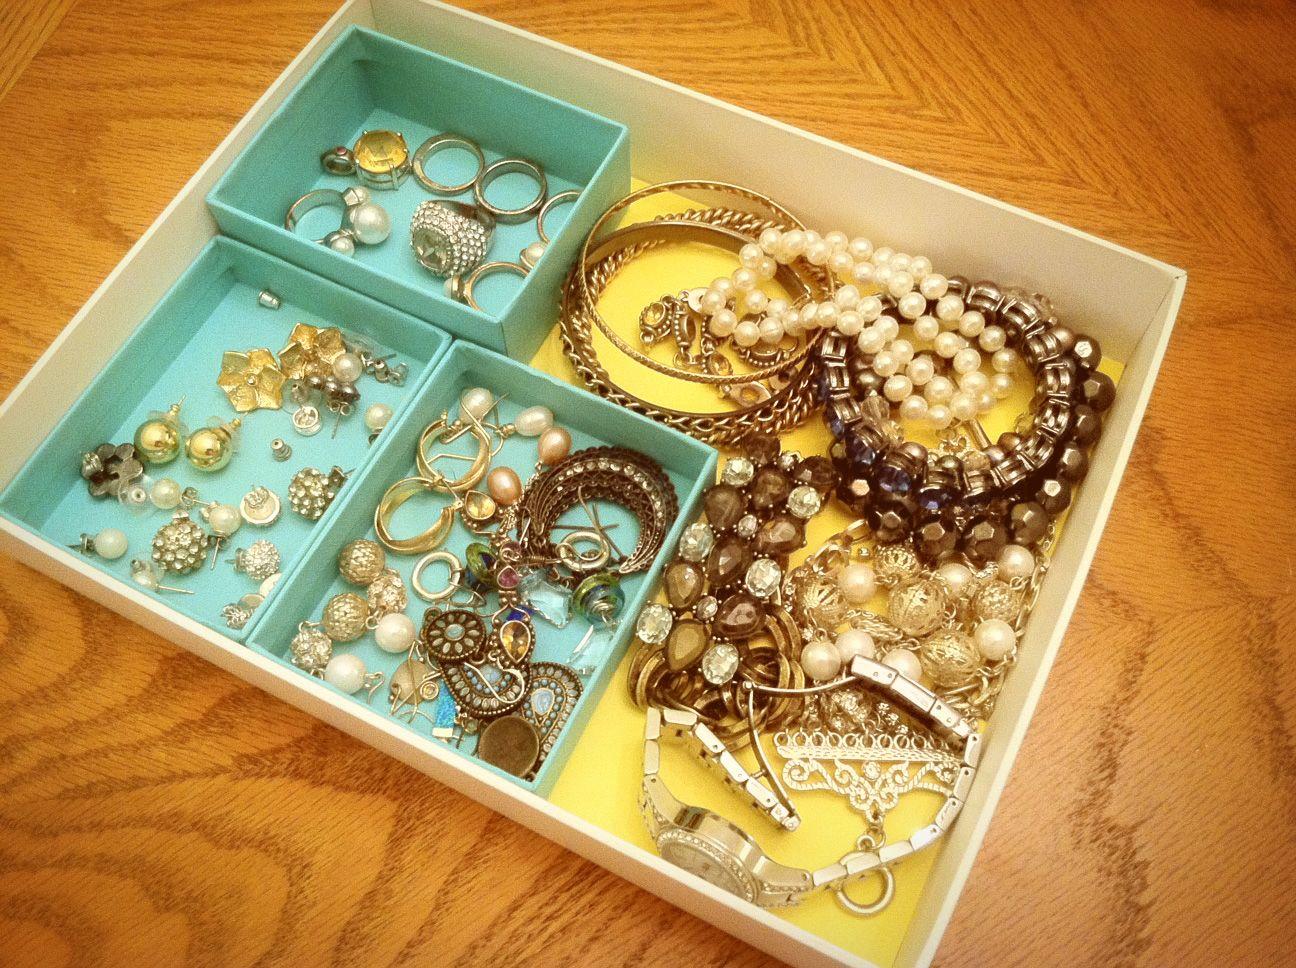 DIY jewelry organizerI used a white cardboard box put yellow